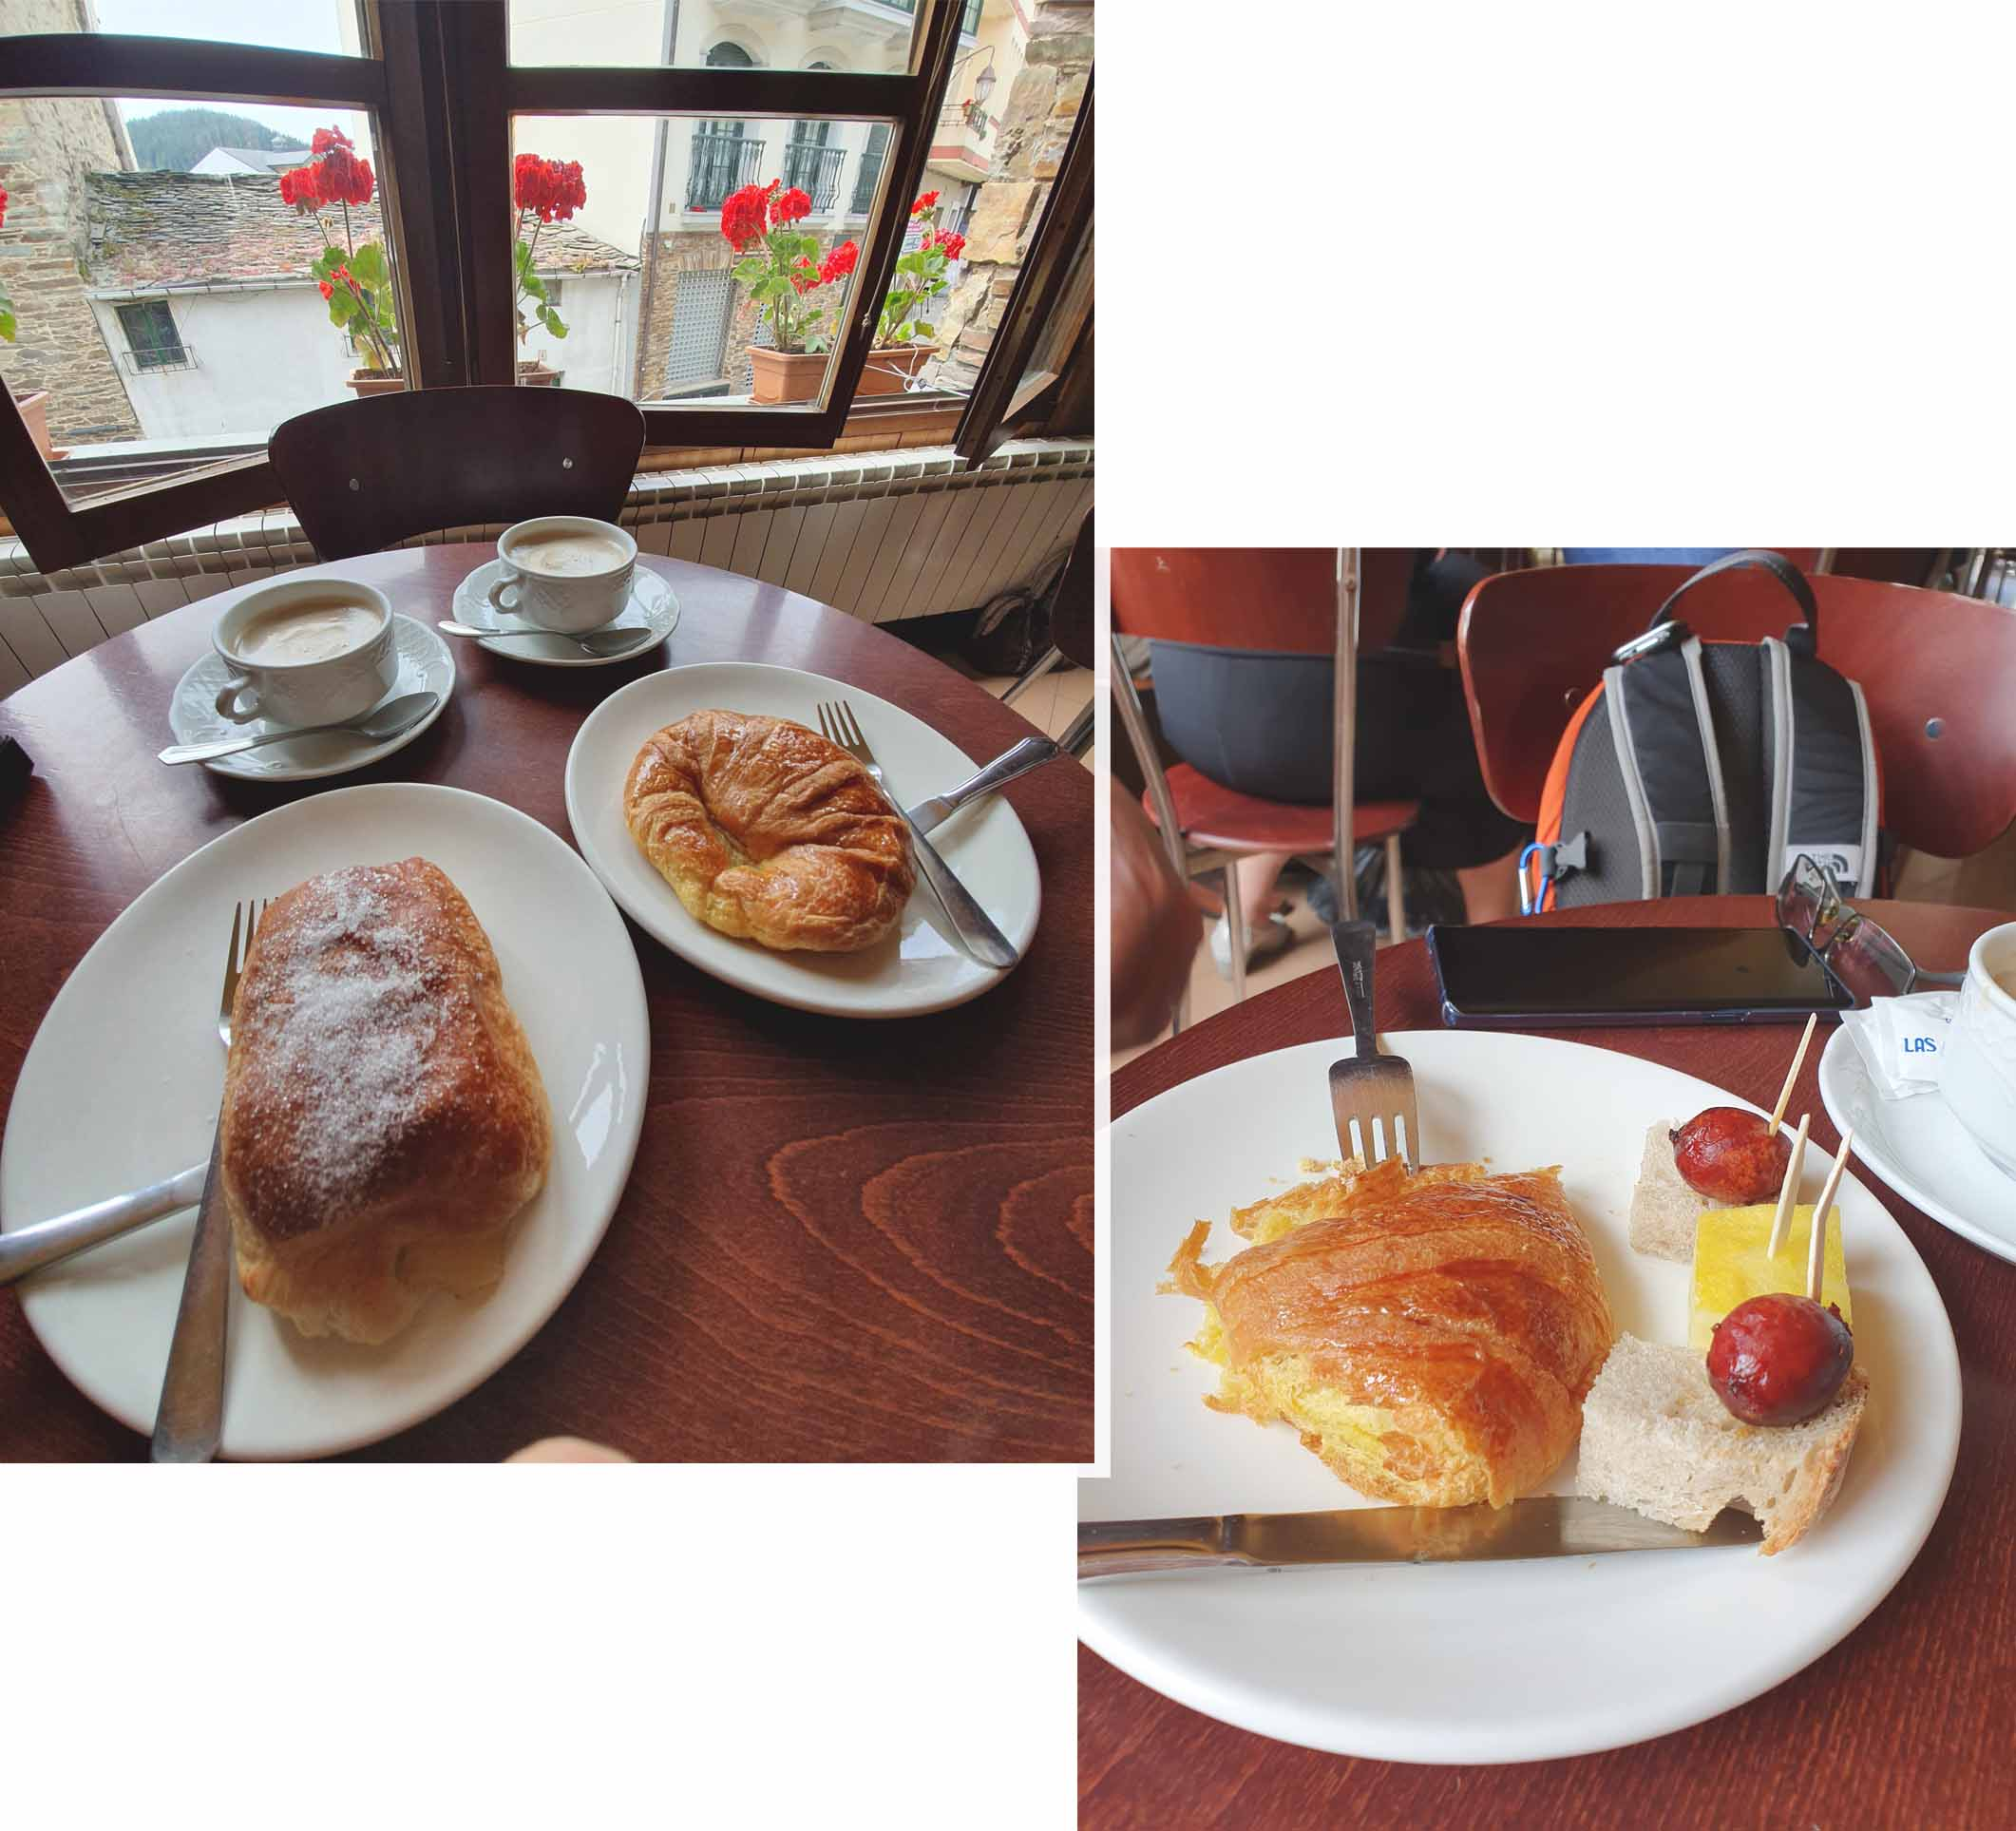 Coffee break with free tapas